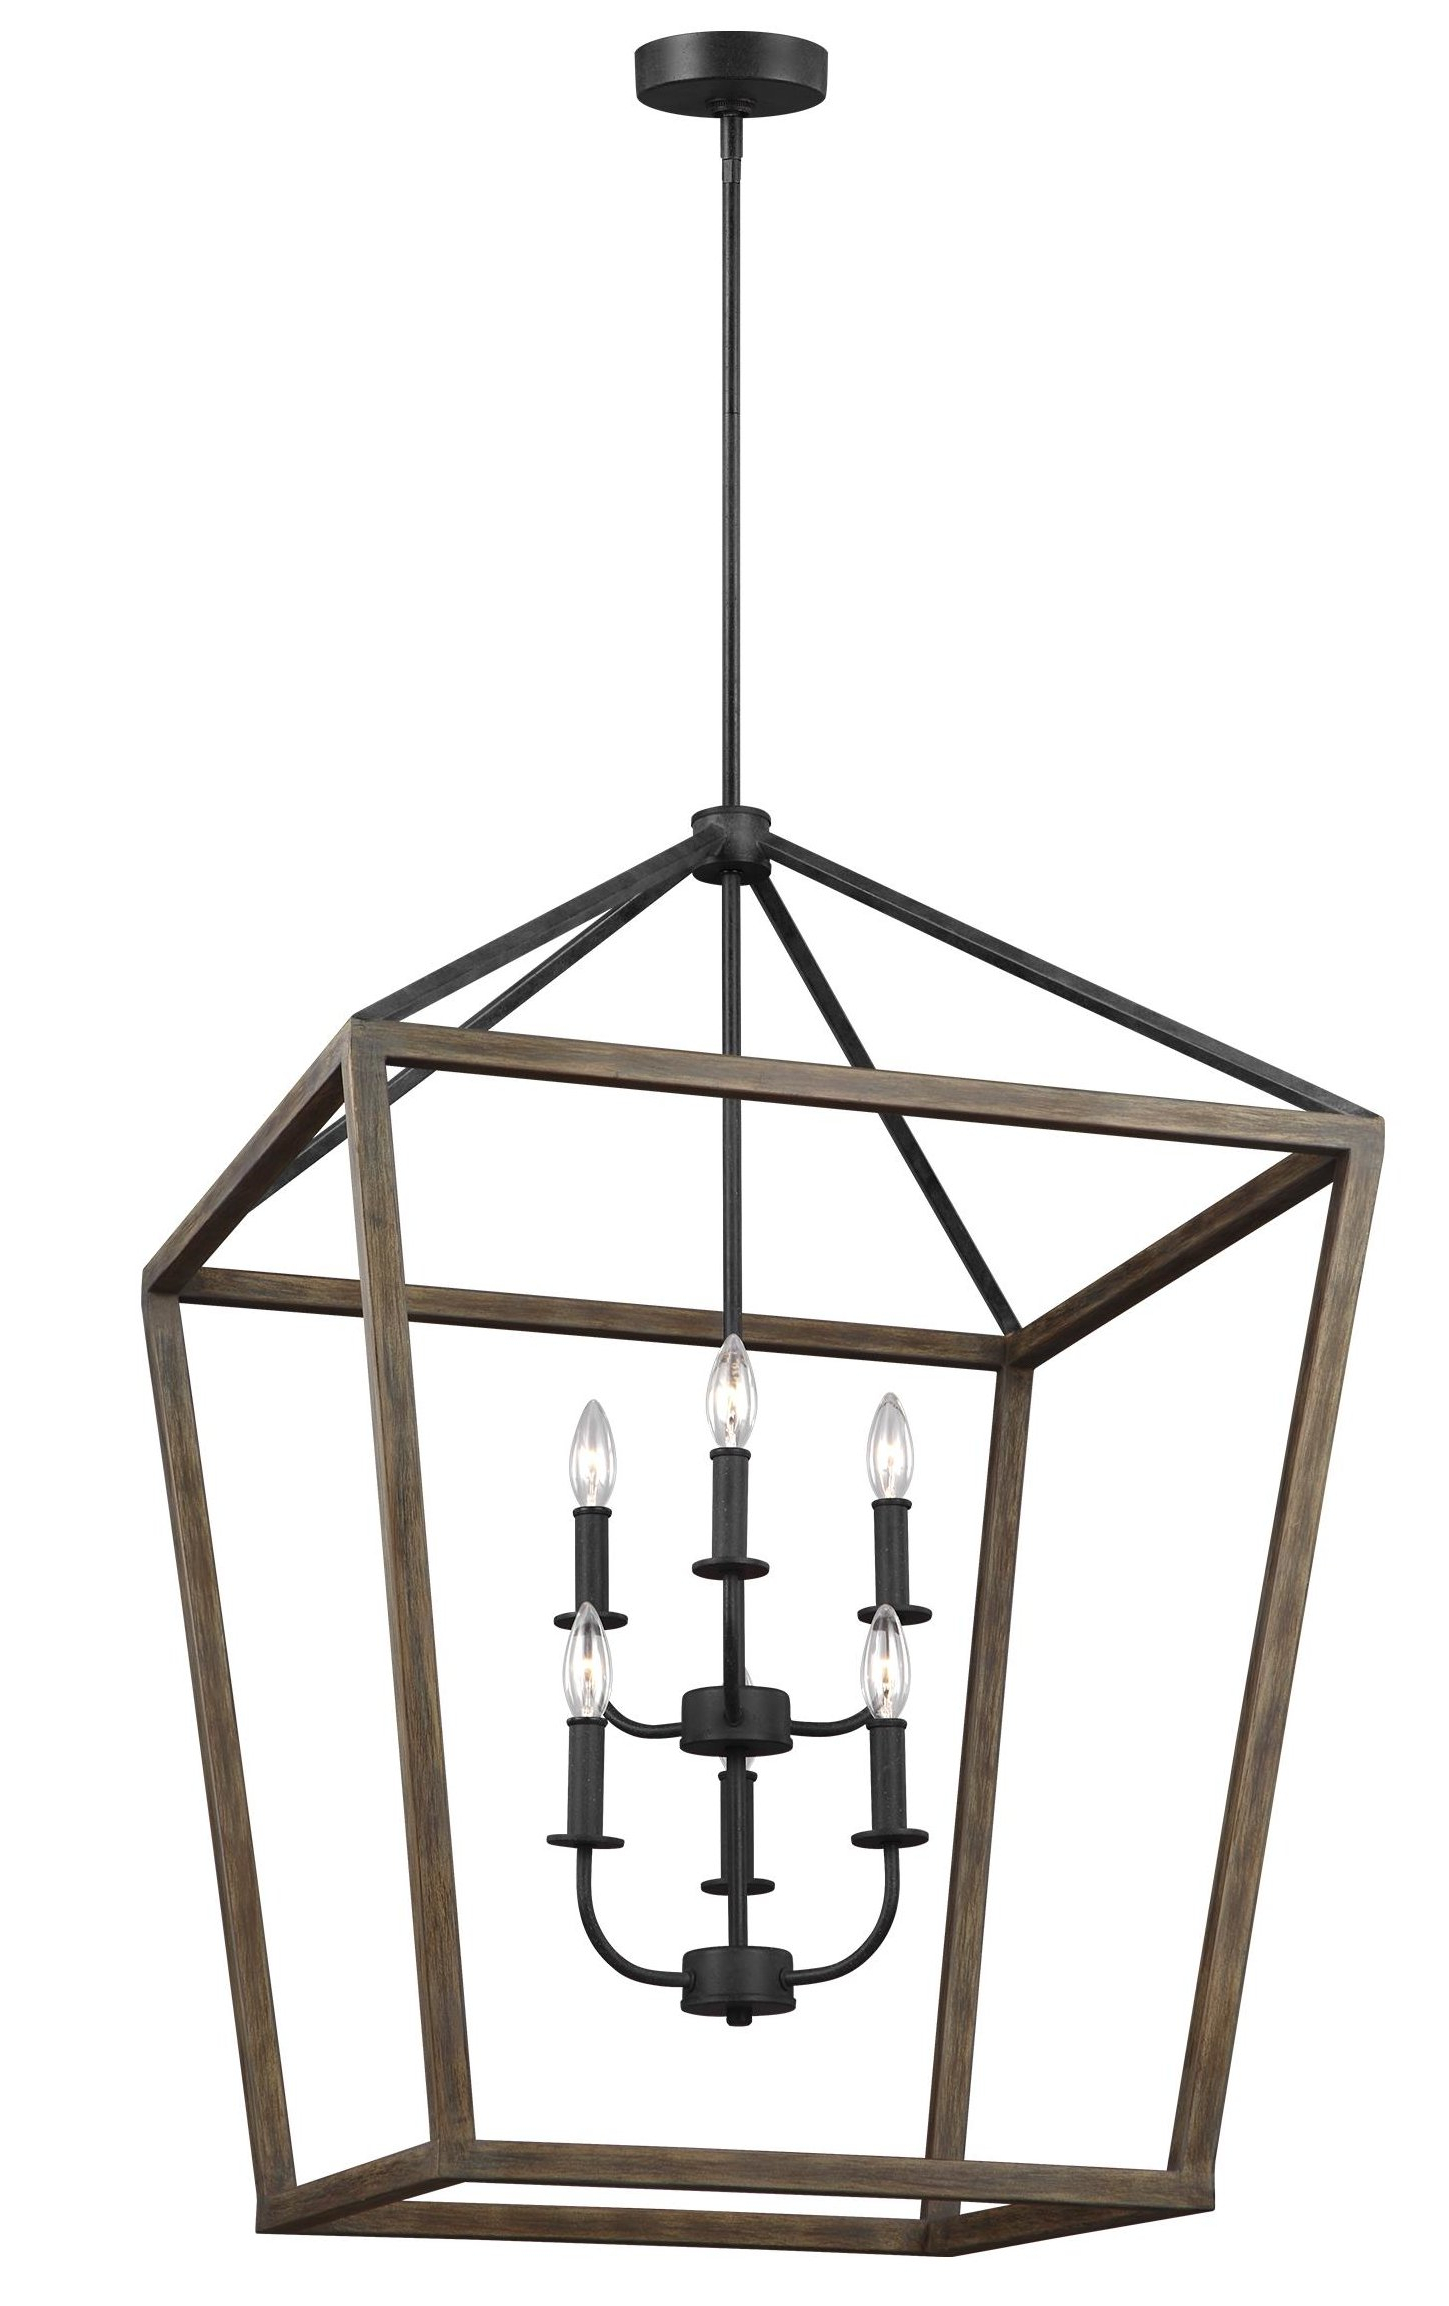 Odie 4 Light Lantern Square Pendants With Regard To Most Current Natarsha 6 Light Lantern Geometric Pendant (View 15 of 25)